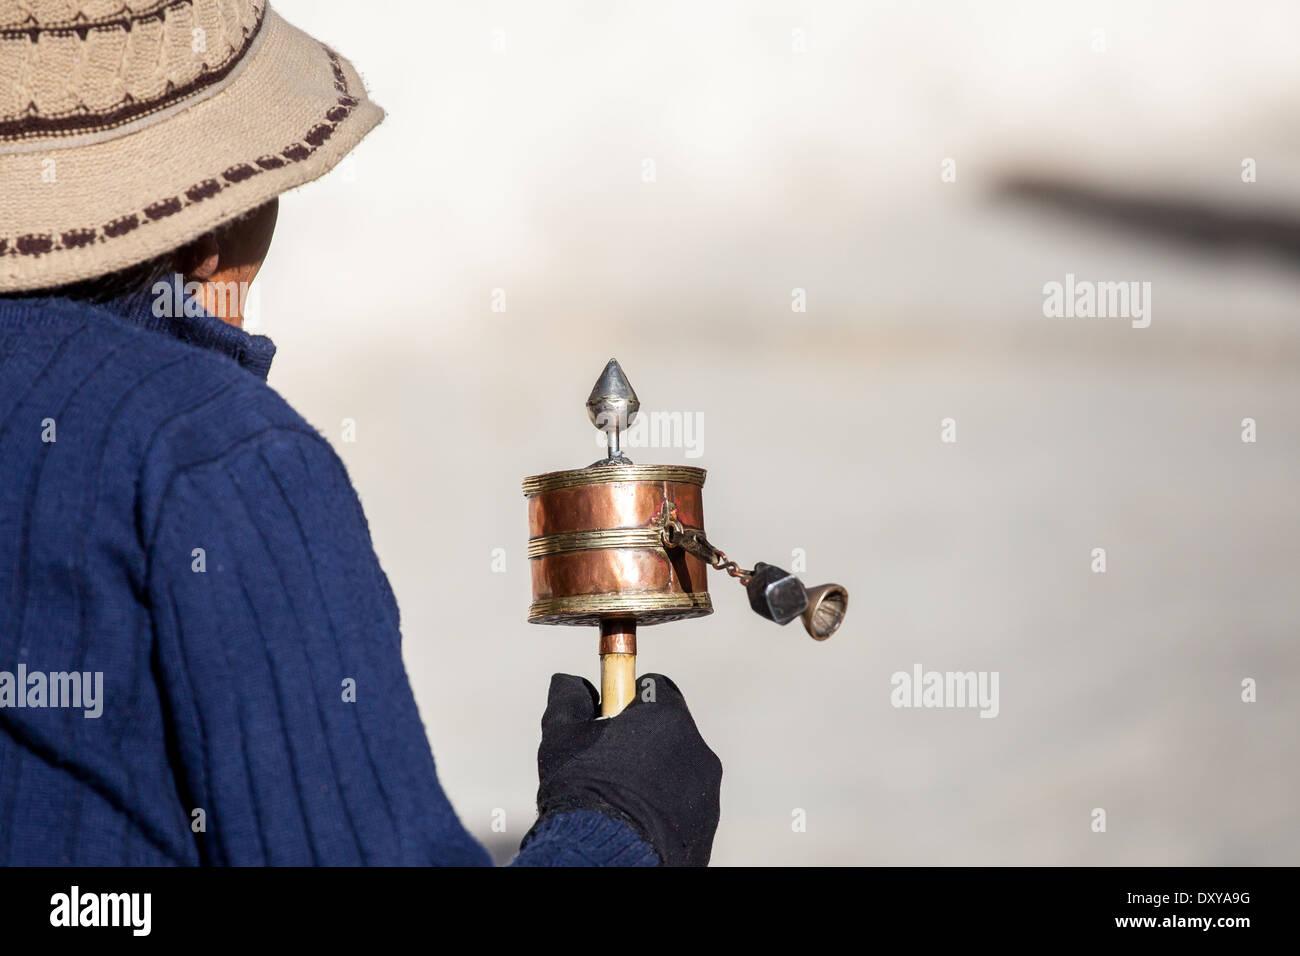 Tibet, prayer wheel - Stock Image